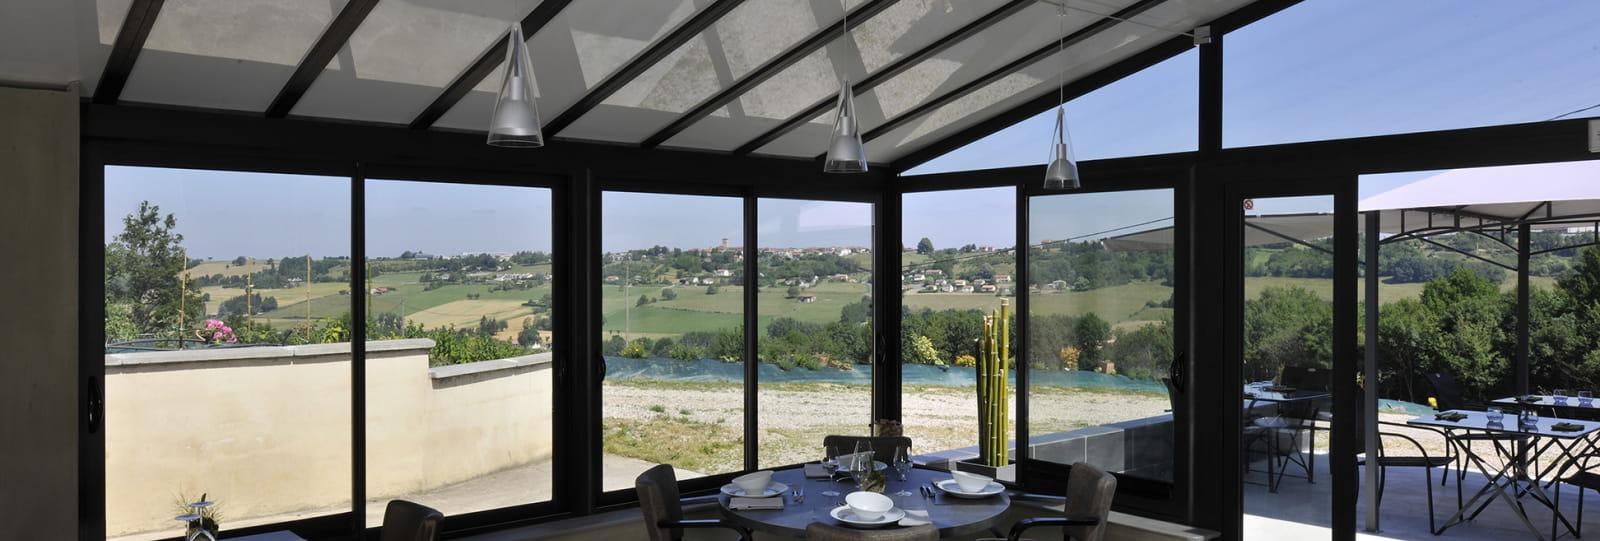 'Spa Oasis Natura' restaurant